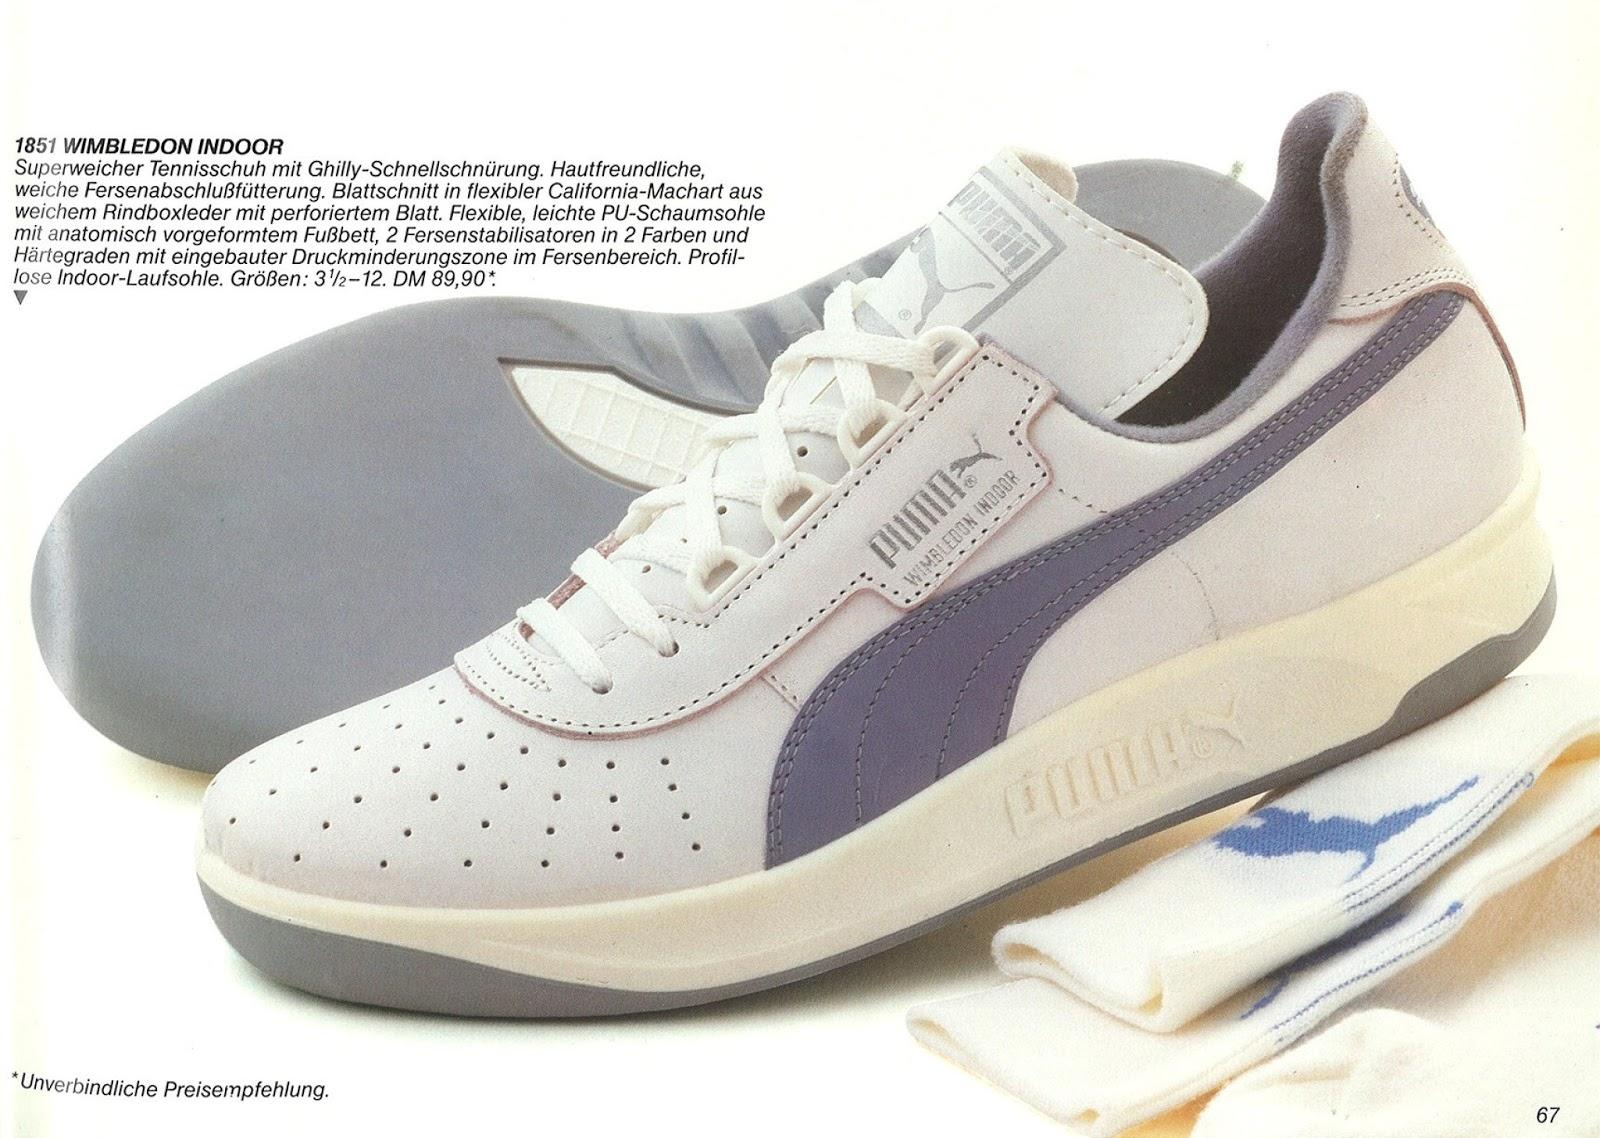 ce114a8279a1 Vintage Adidas and Puma Blog